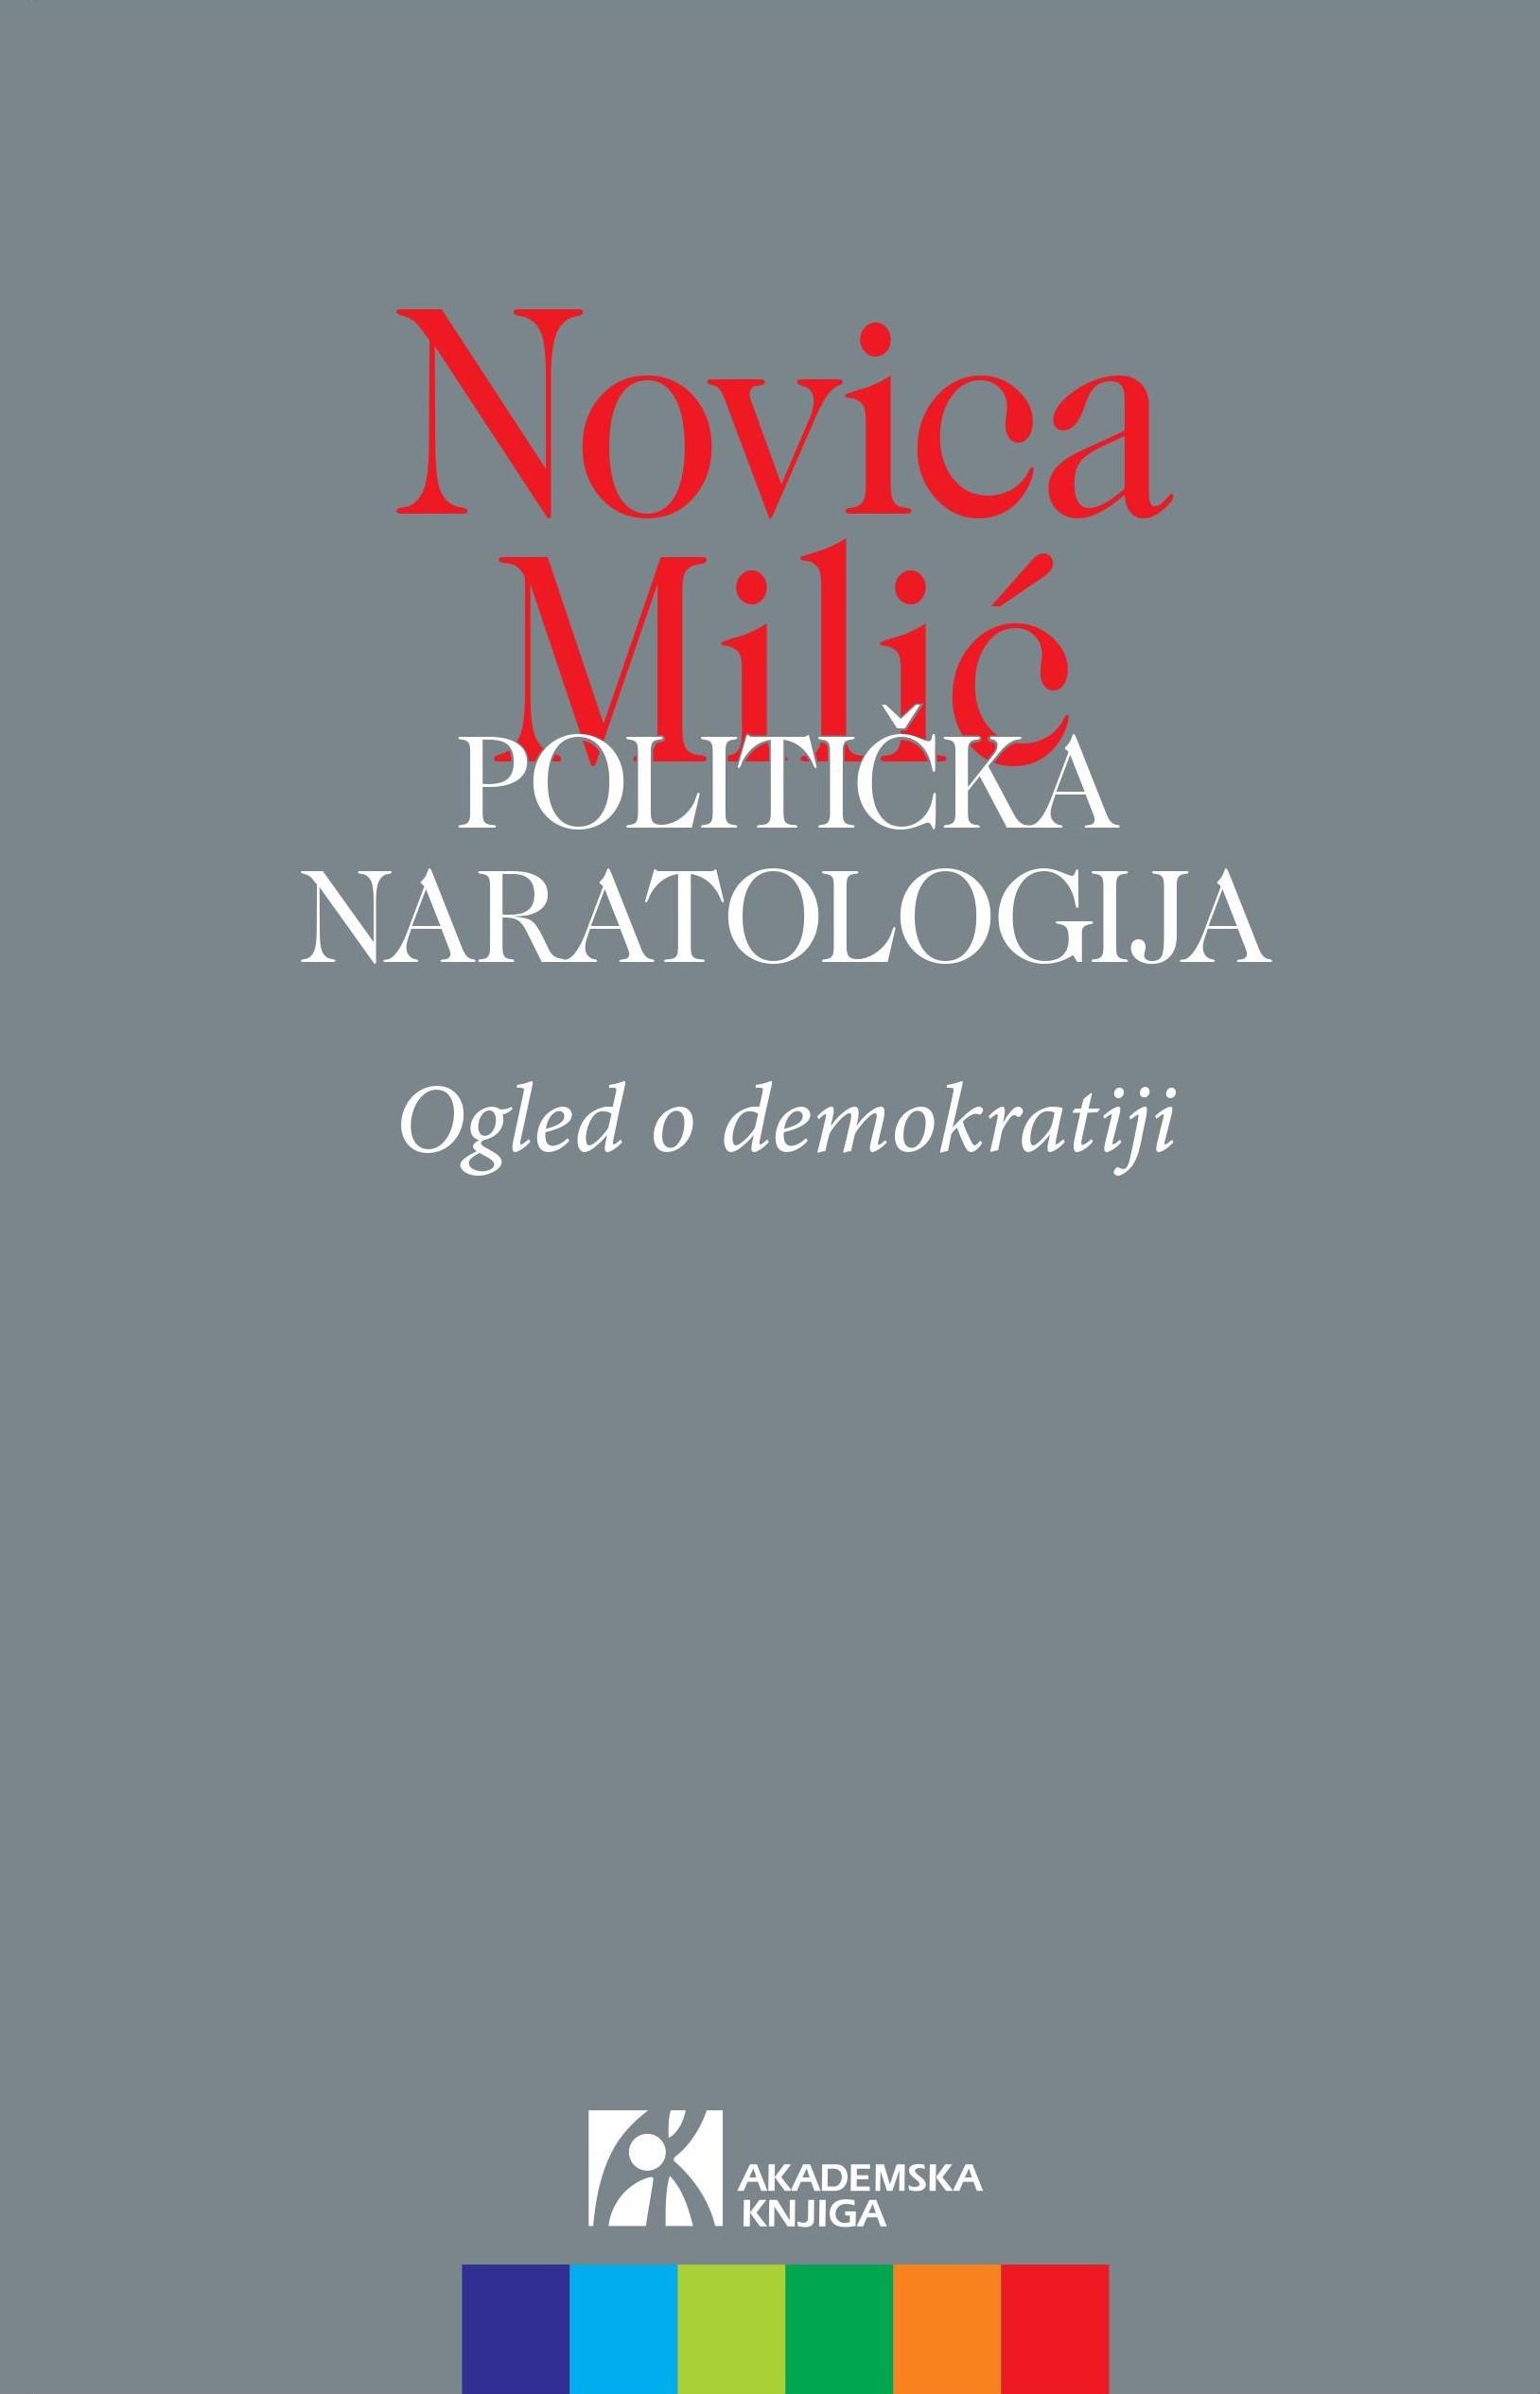 POLITIČKA NARATOLOGIJA. </br> Ogled o demokratiji